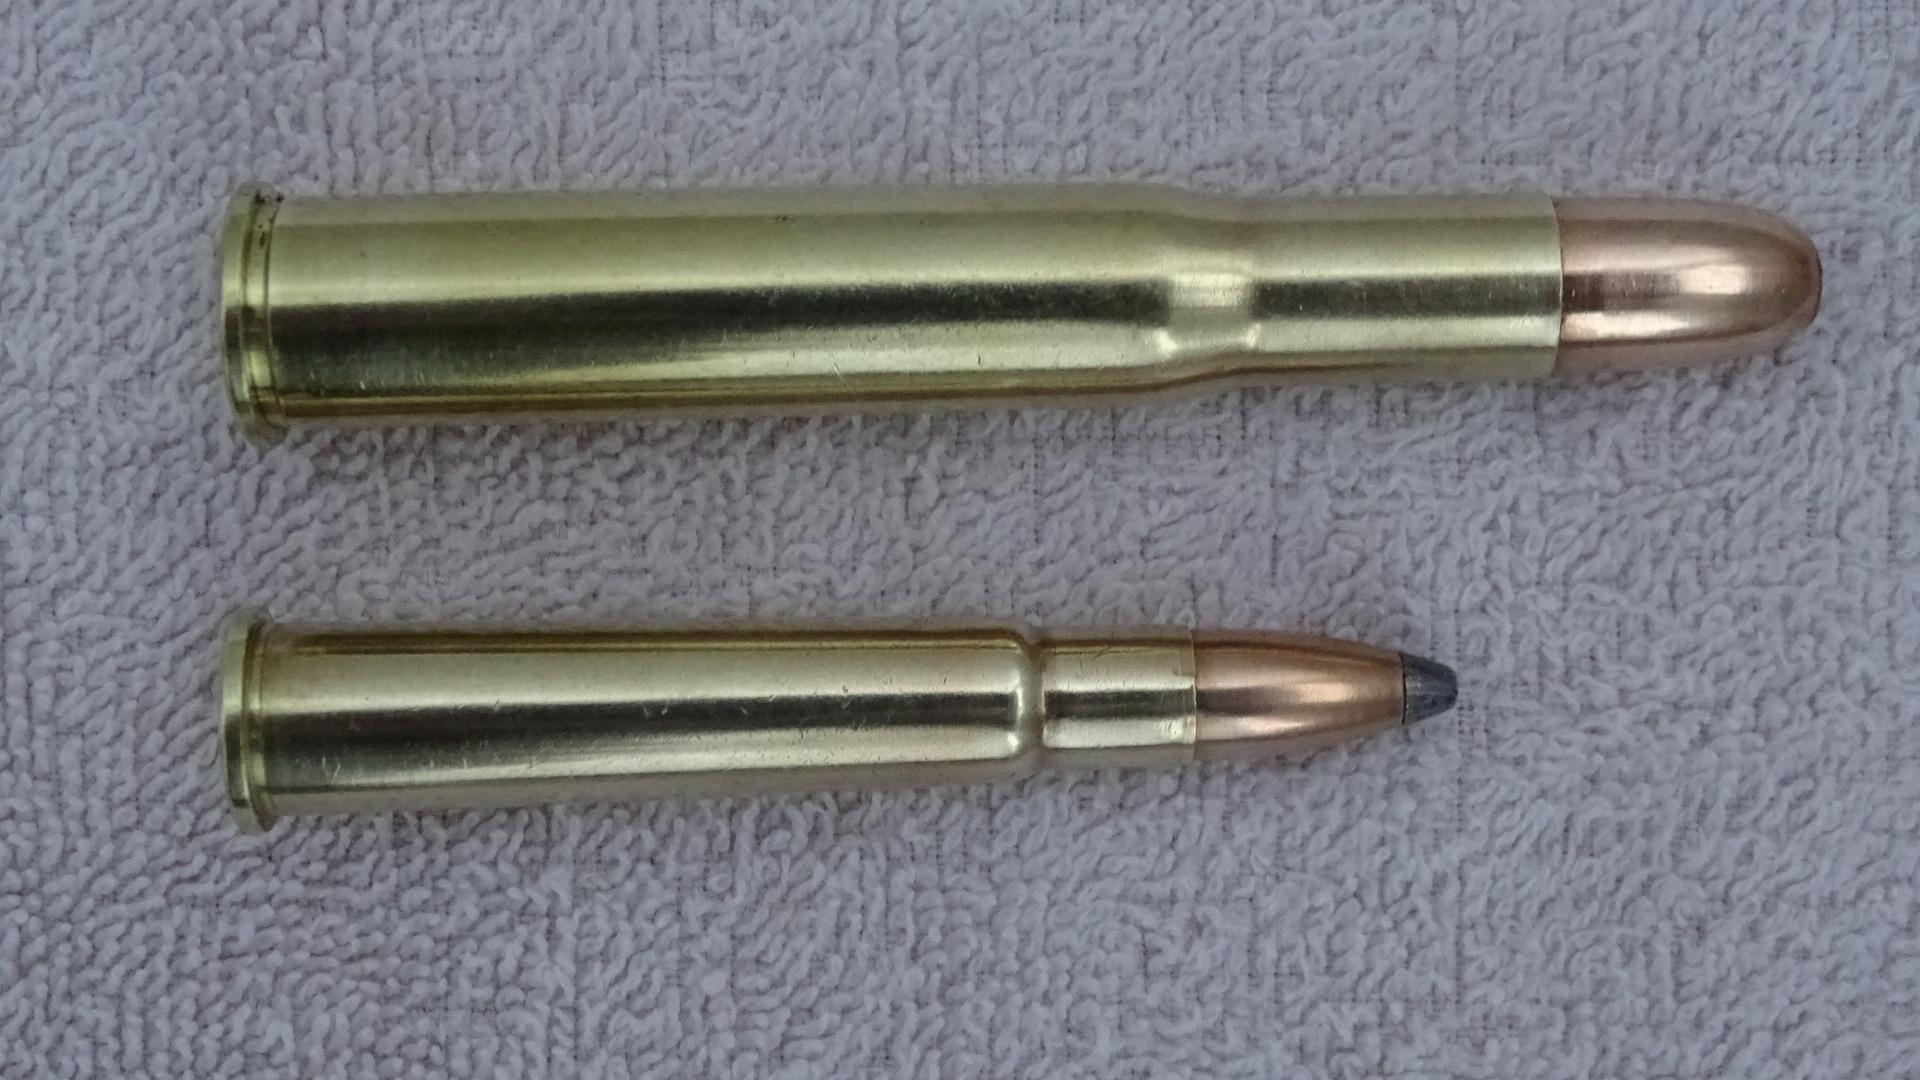 DSC02458.JPG